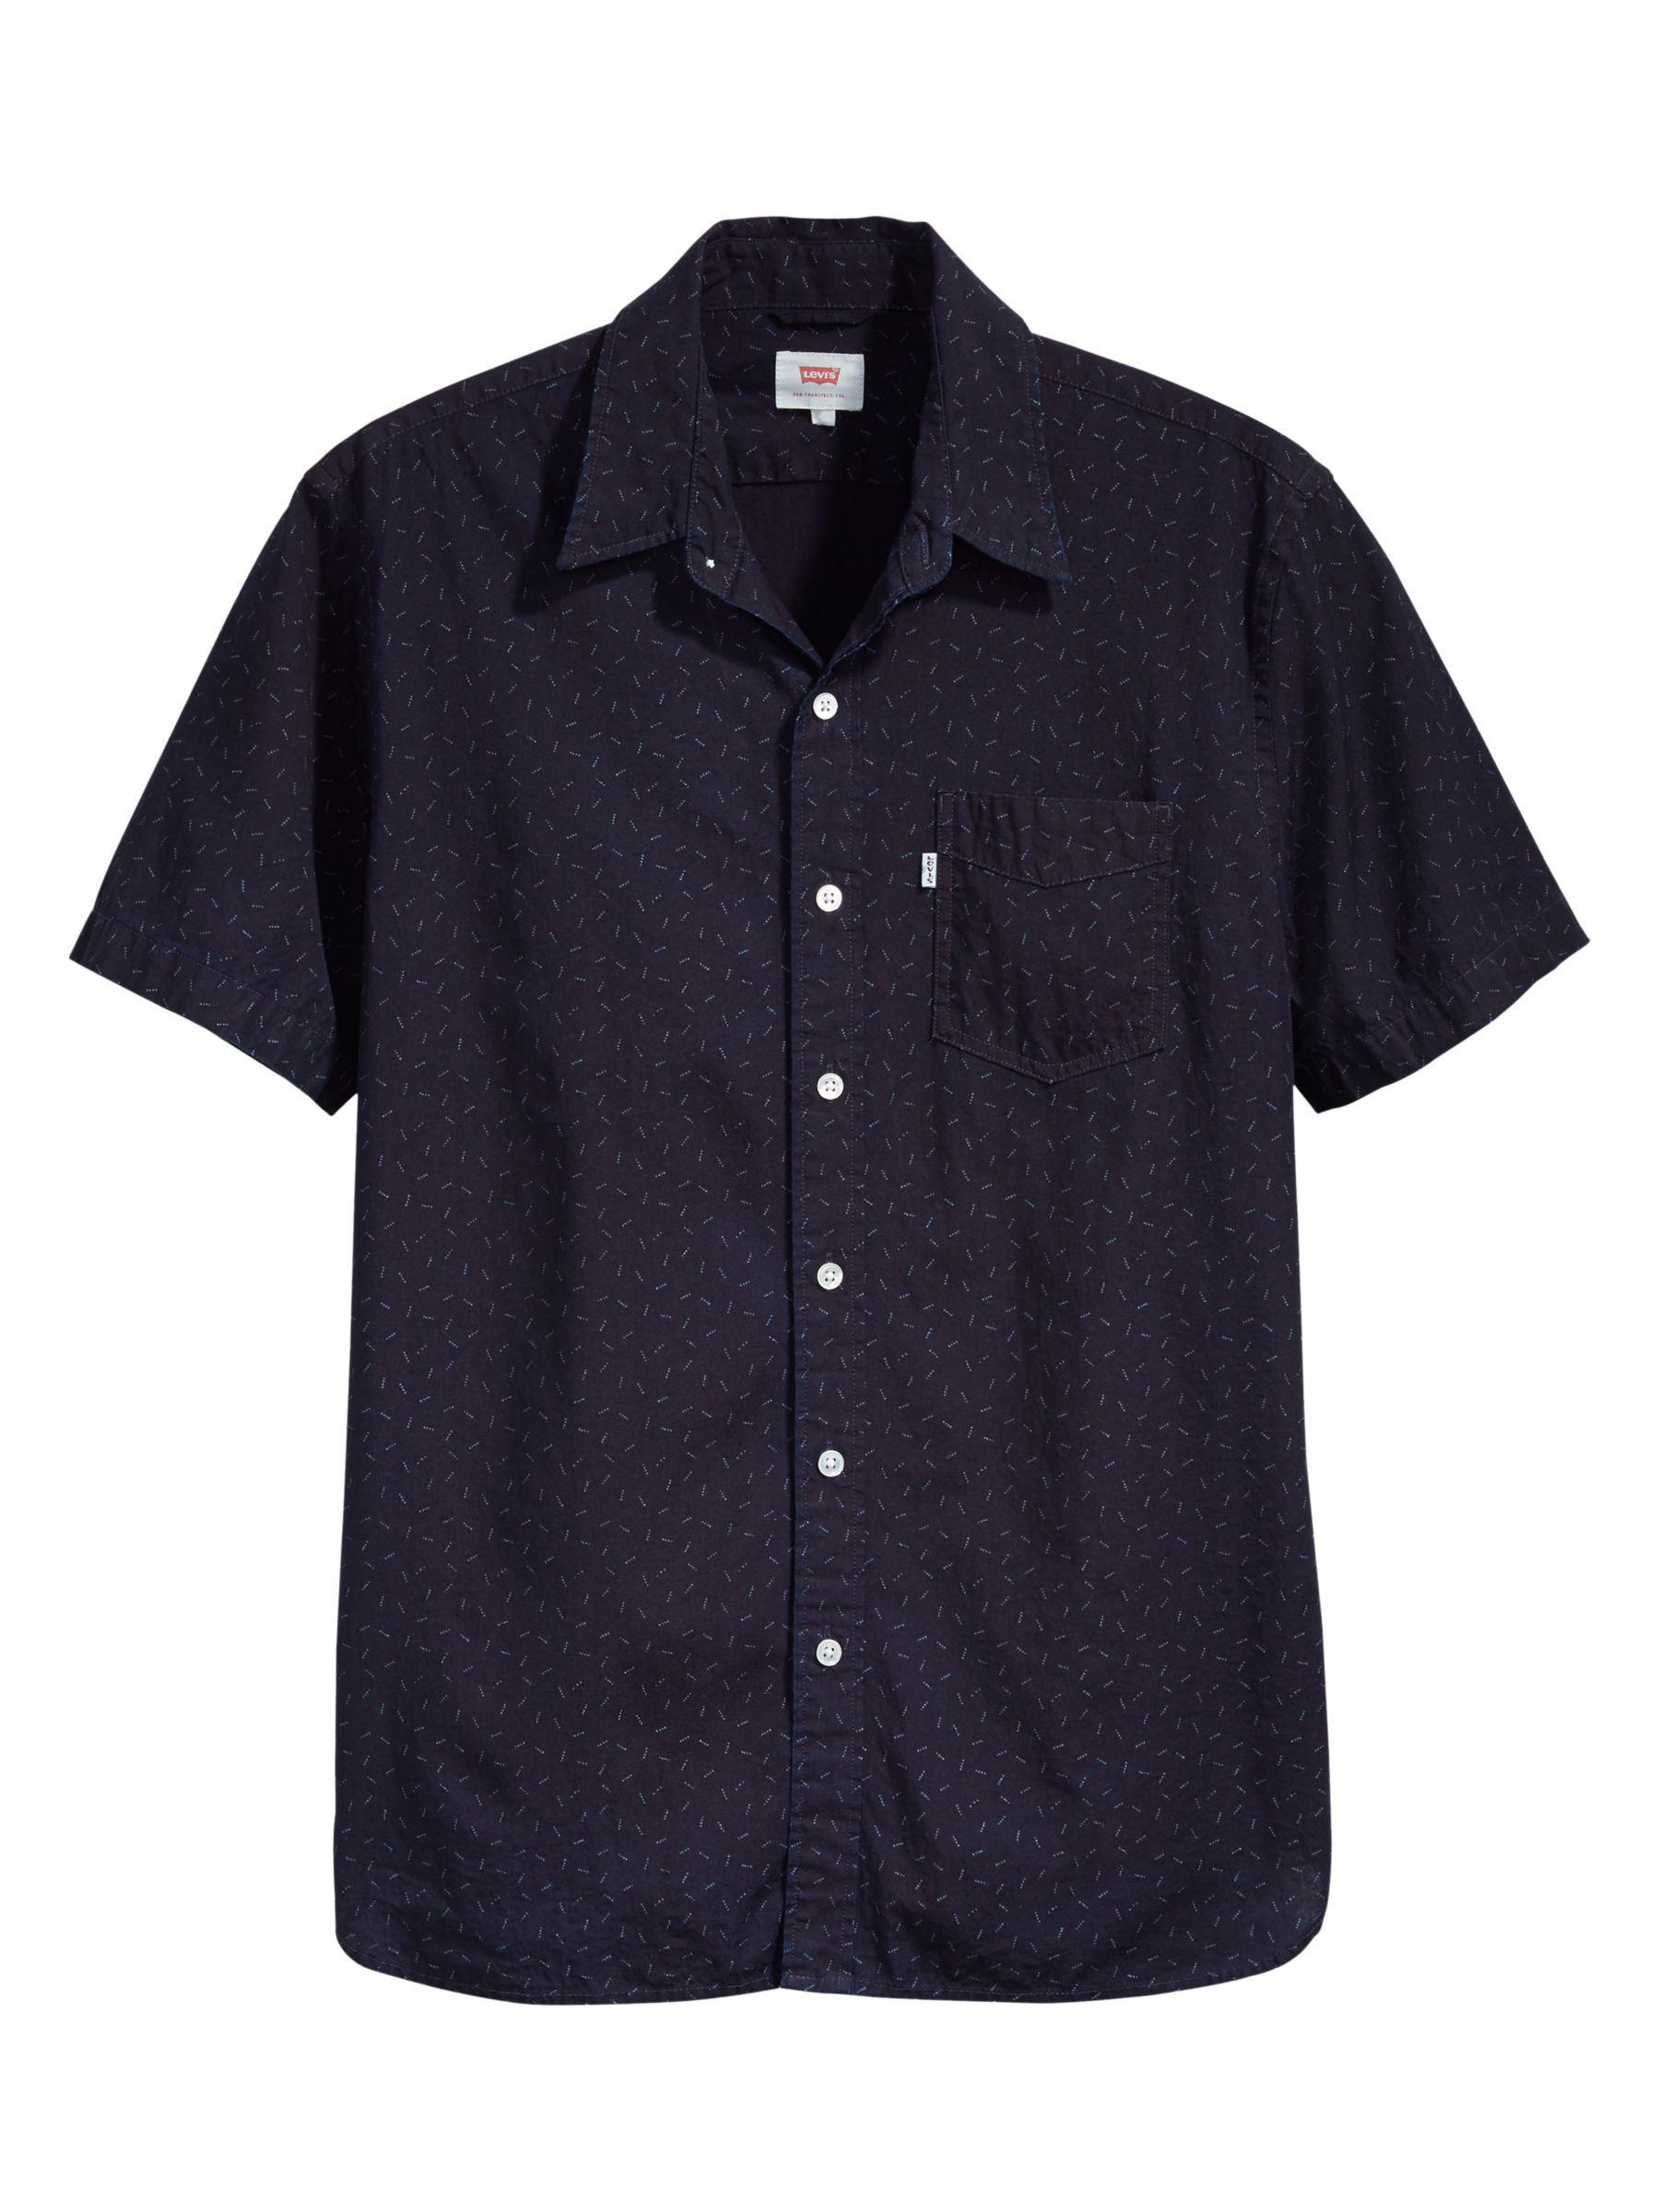 e8afb365e Levi's Sunset One Pocket Short Sleeve Shirt in Blue for Men - Lyst